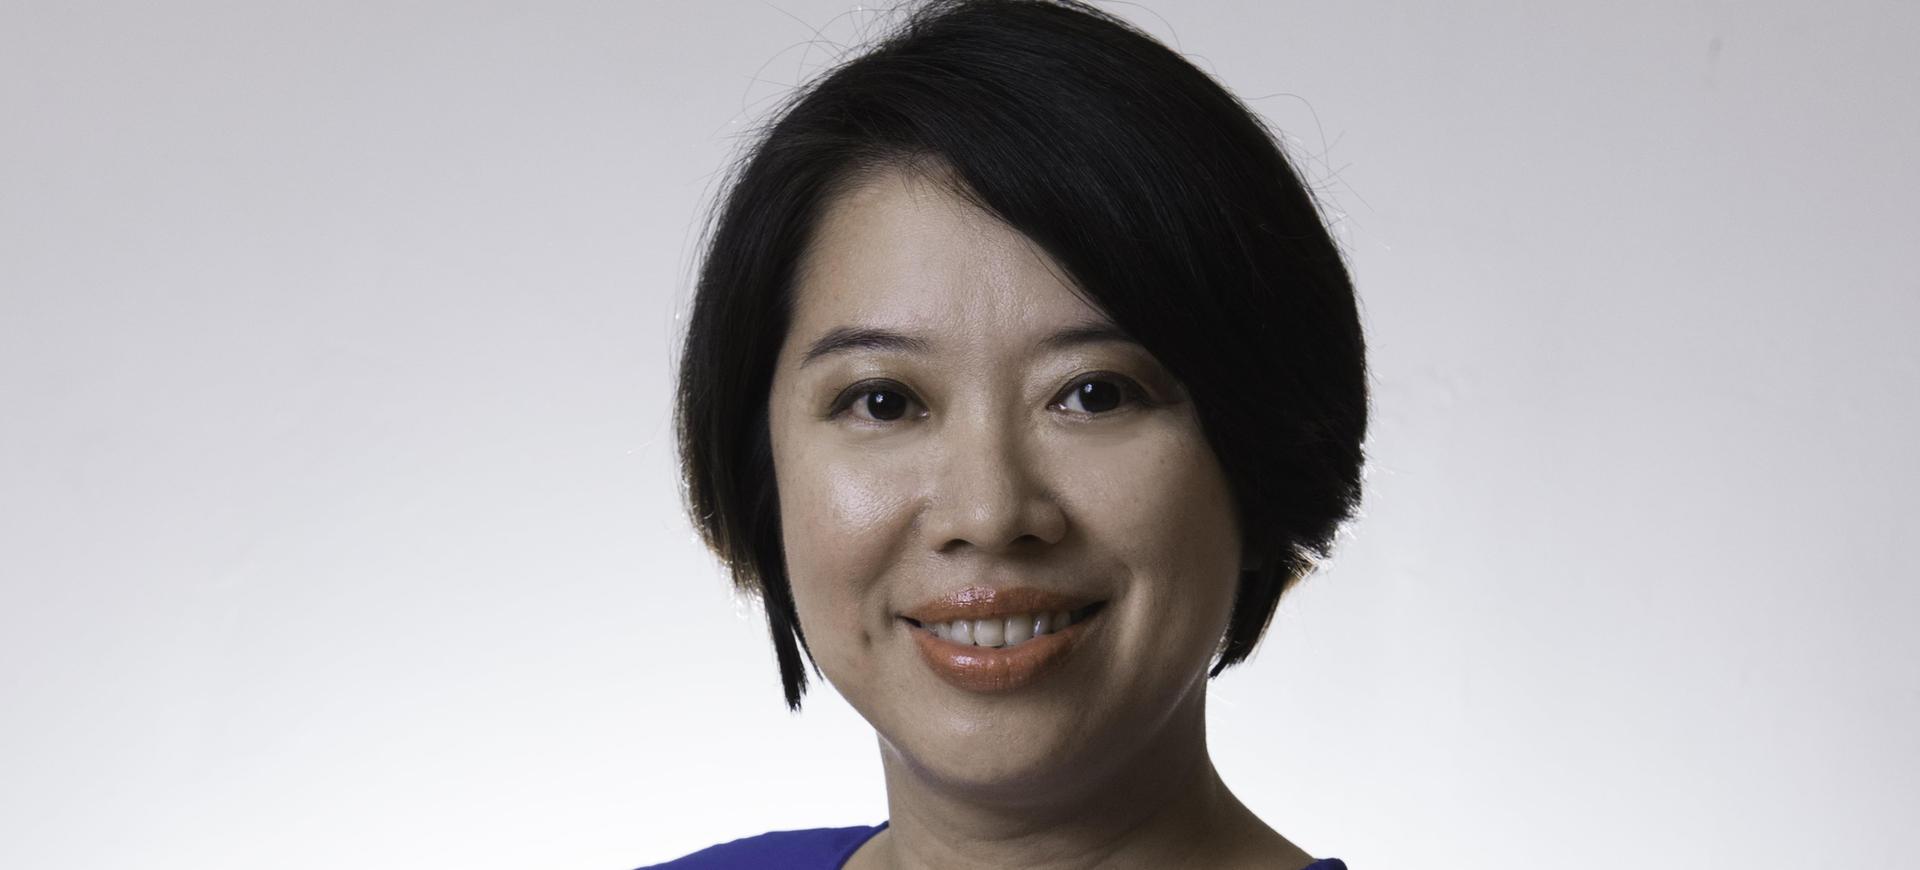 Ms. Susanna SAW (Malaysia)